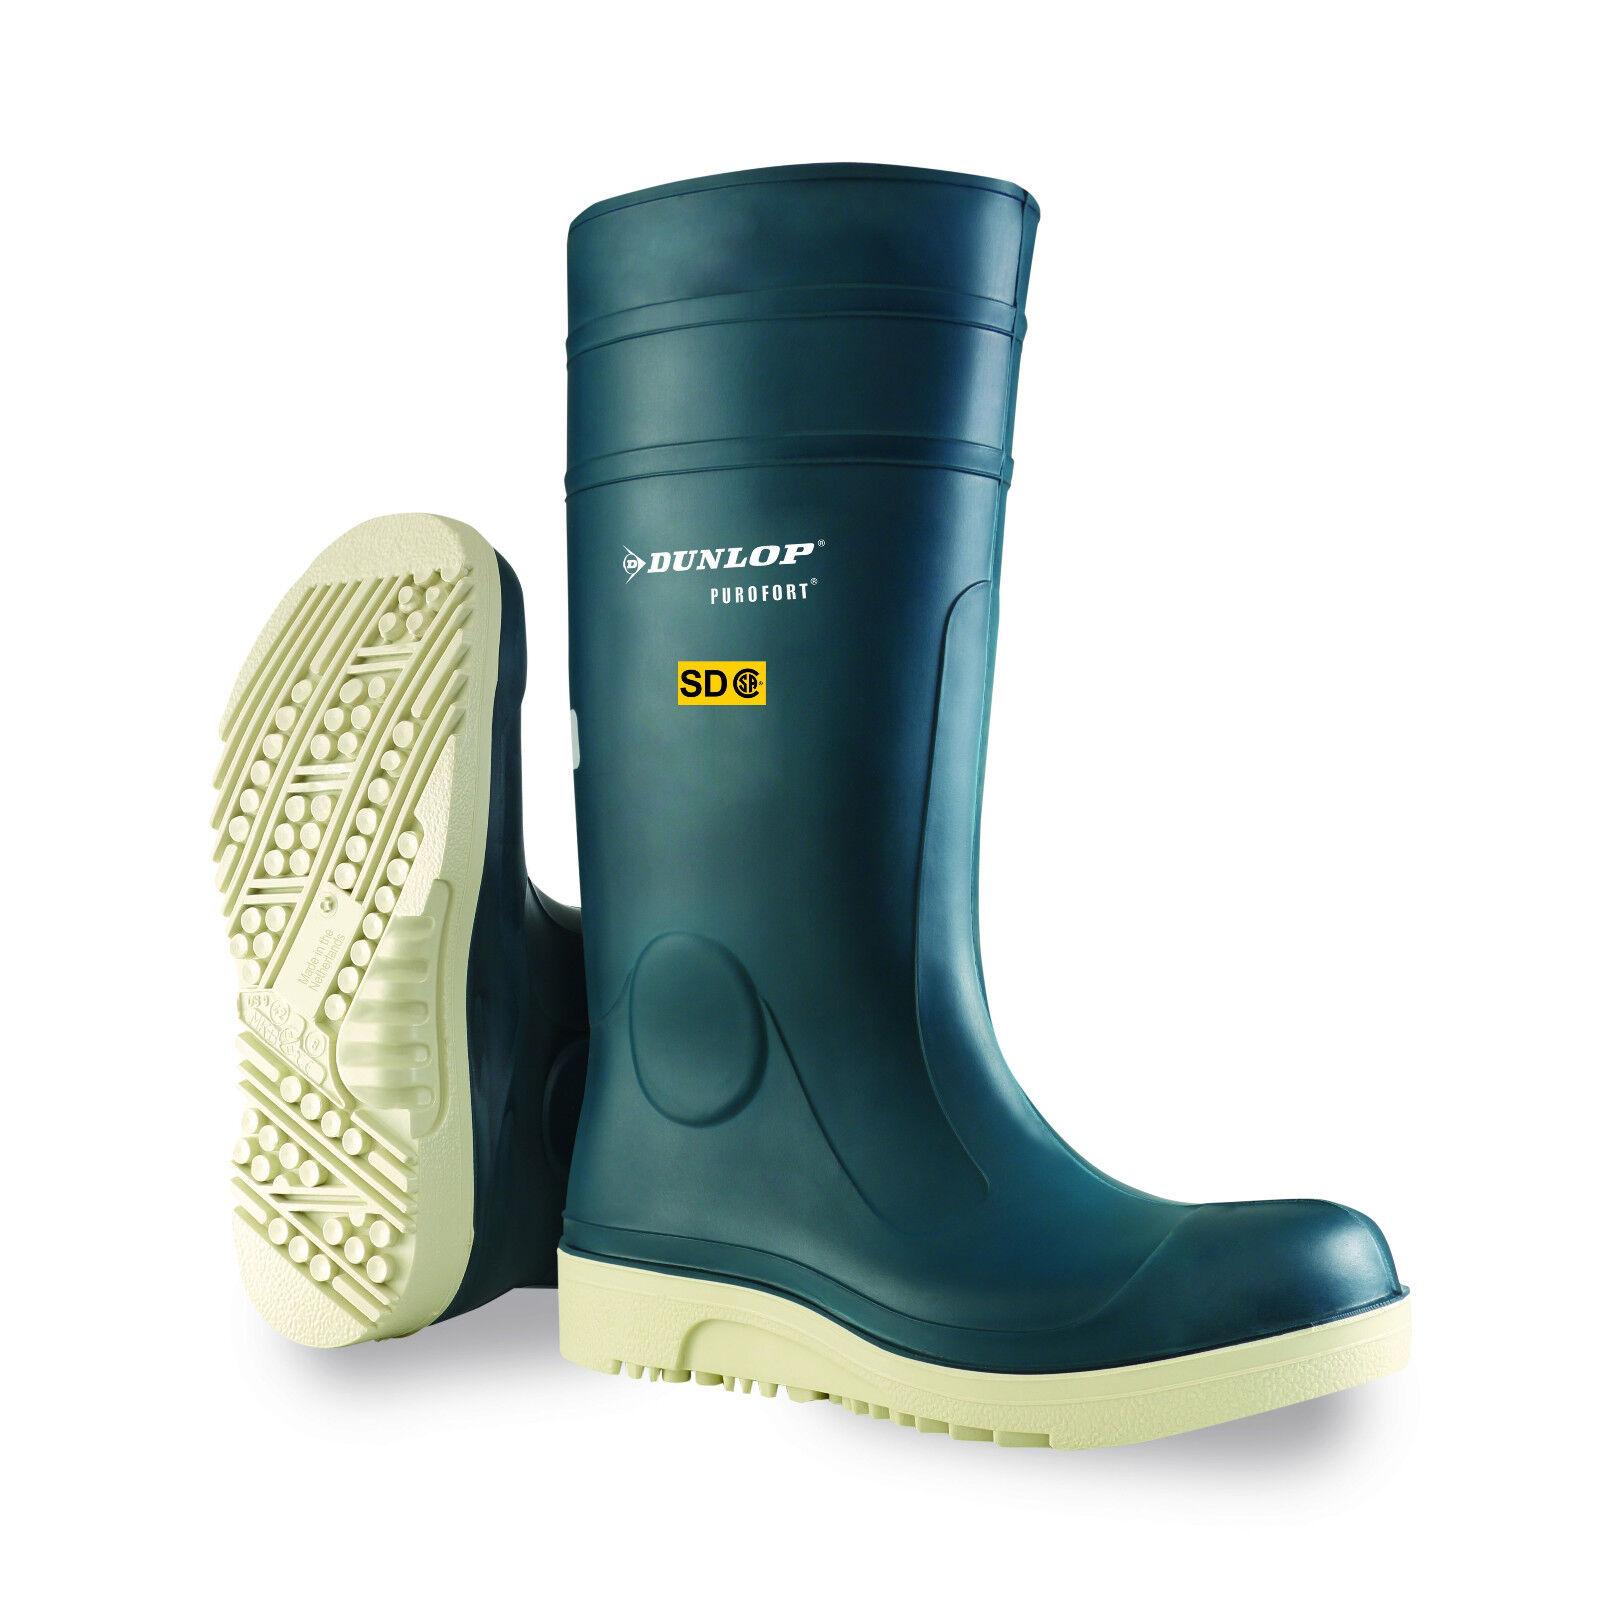 Men's Dunlop Purofort® Comfort Grip Boot in Navy White  F260673